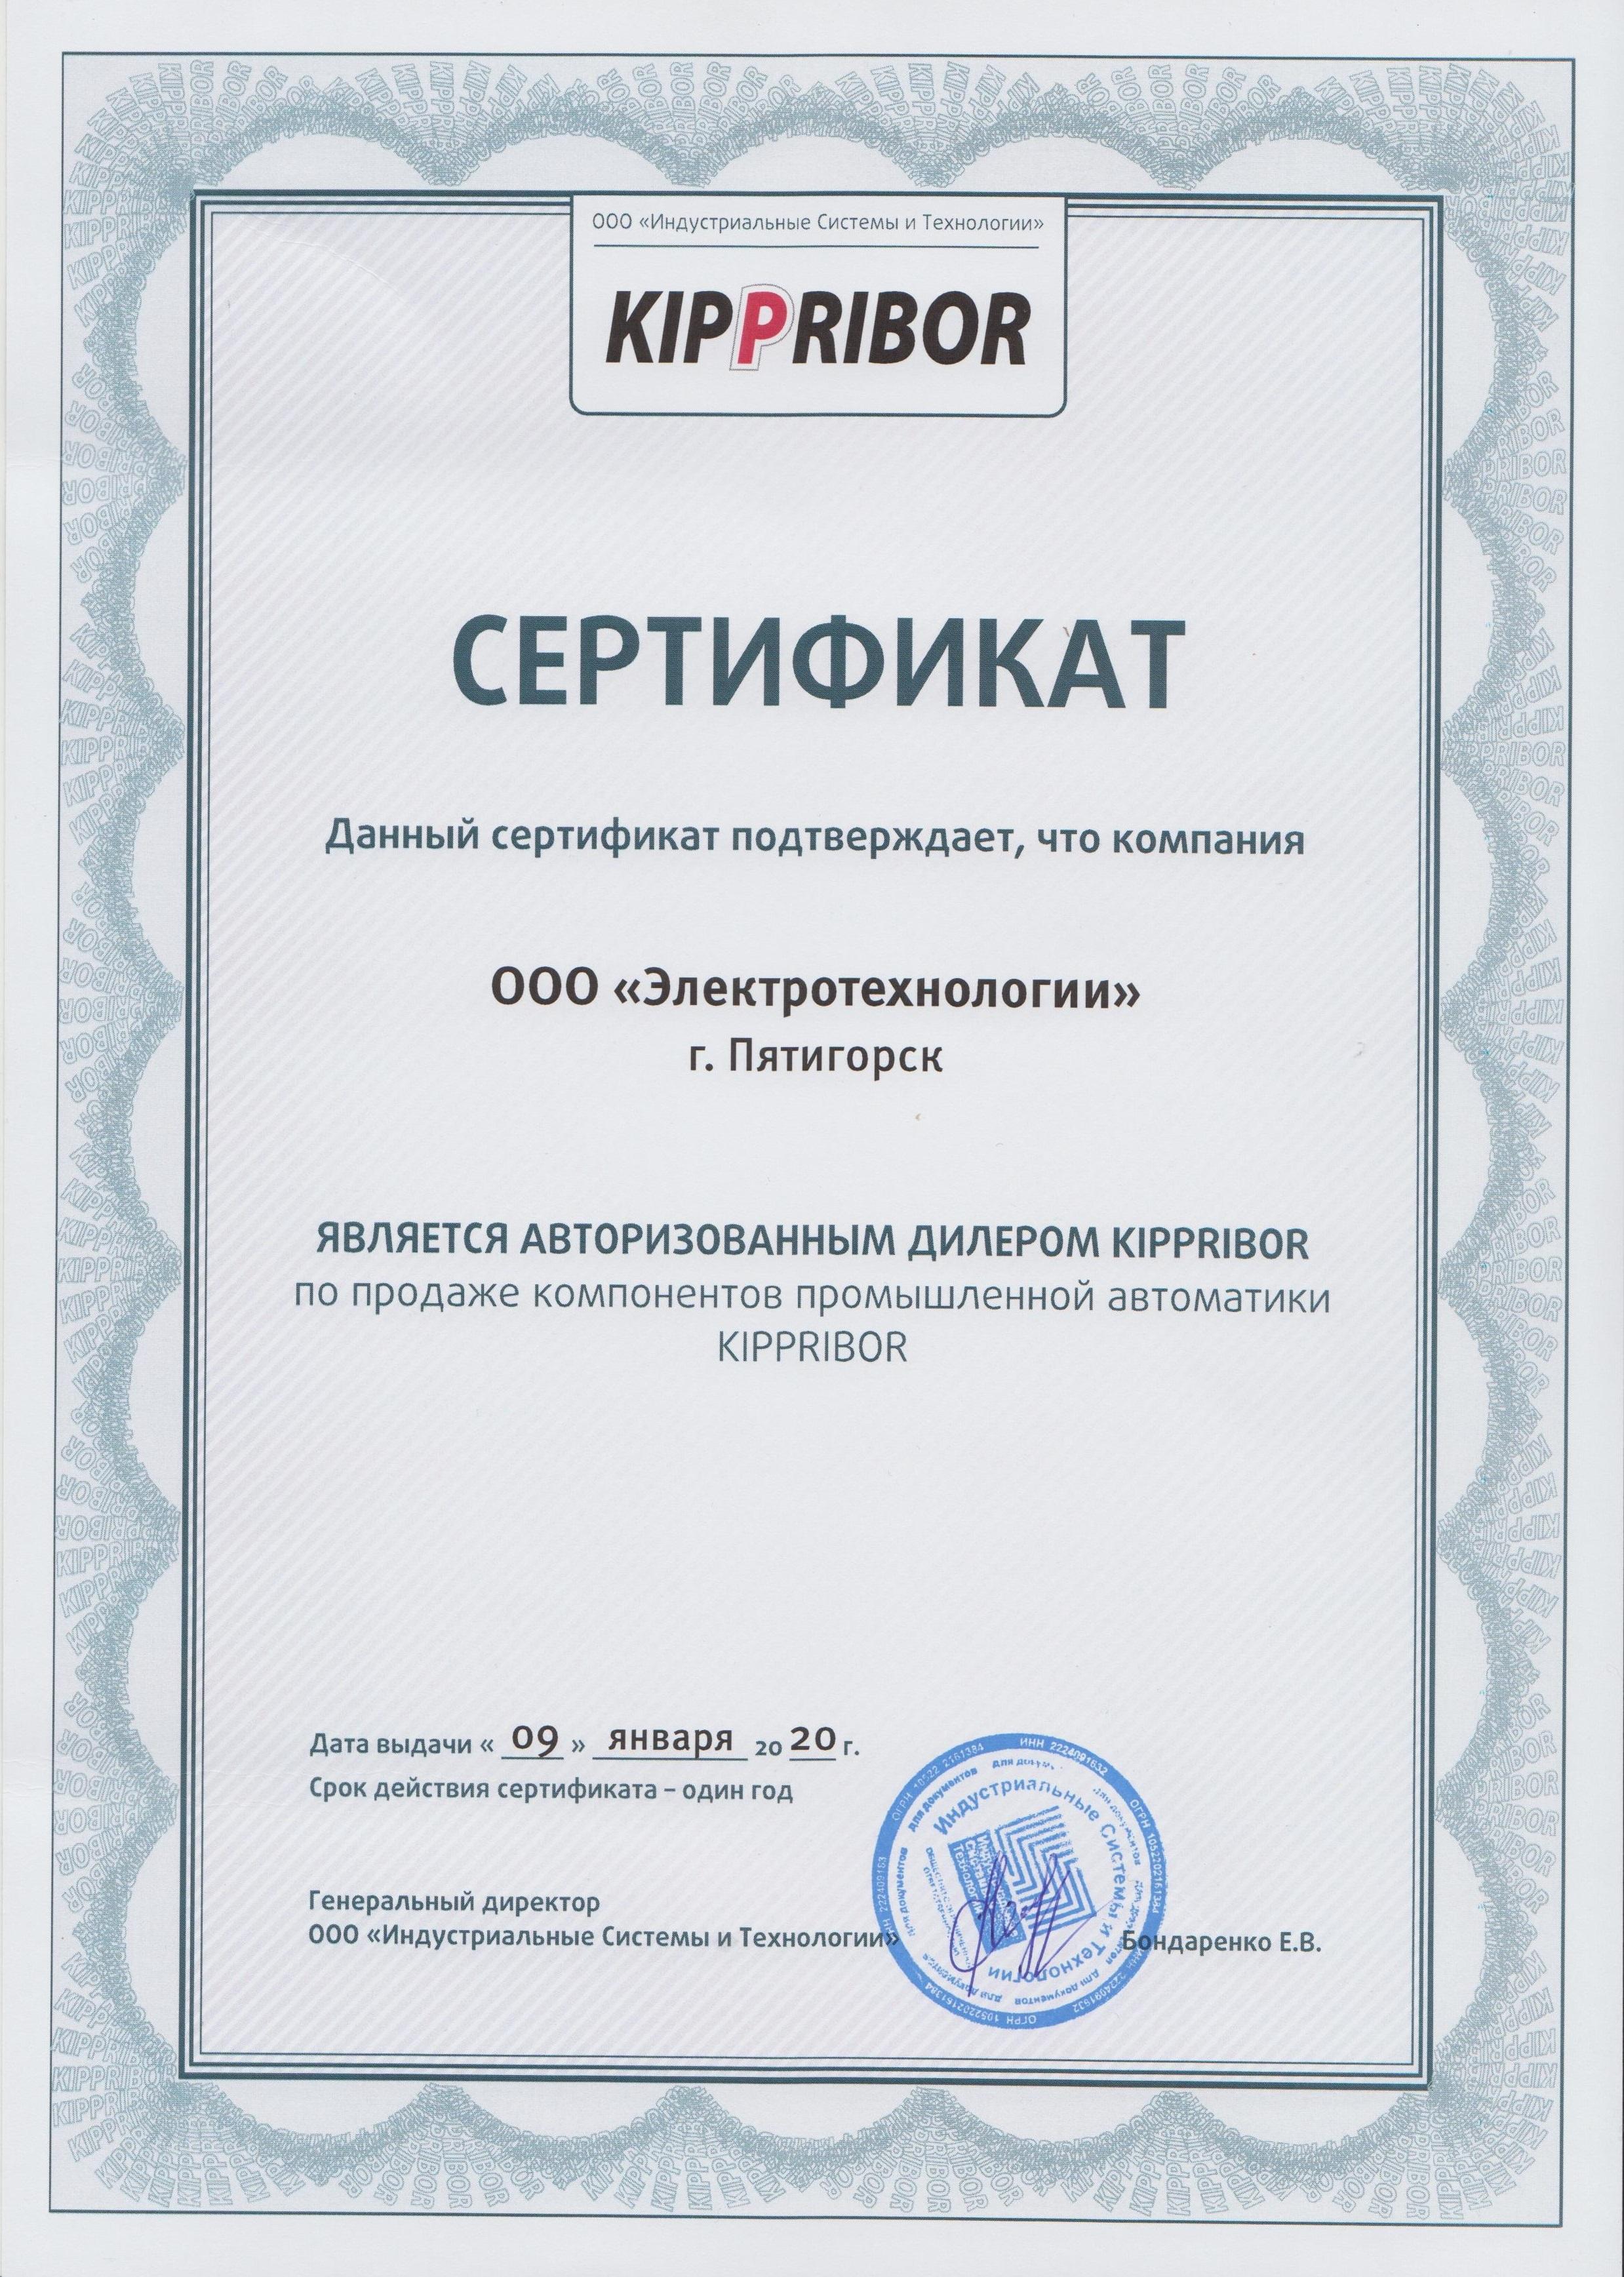 Сертификат KIPPRIBOR